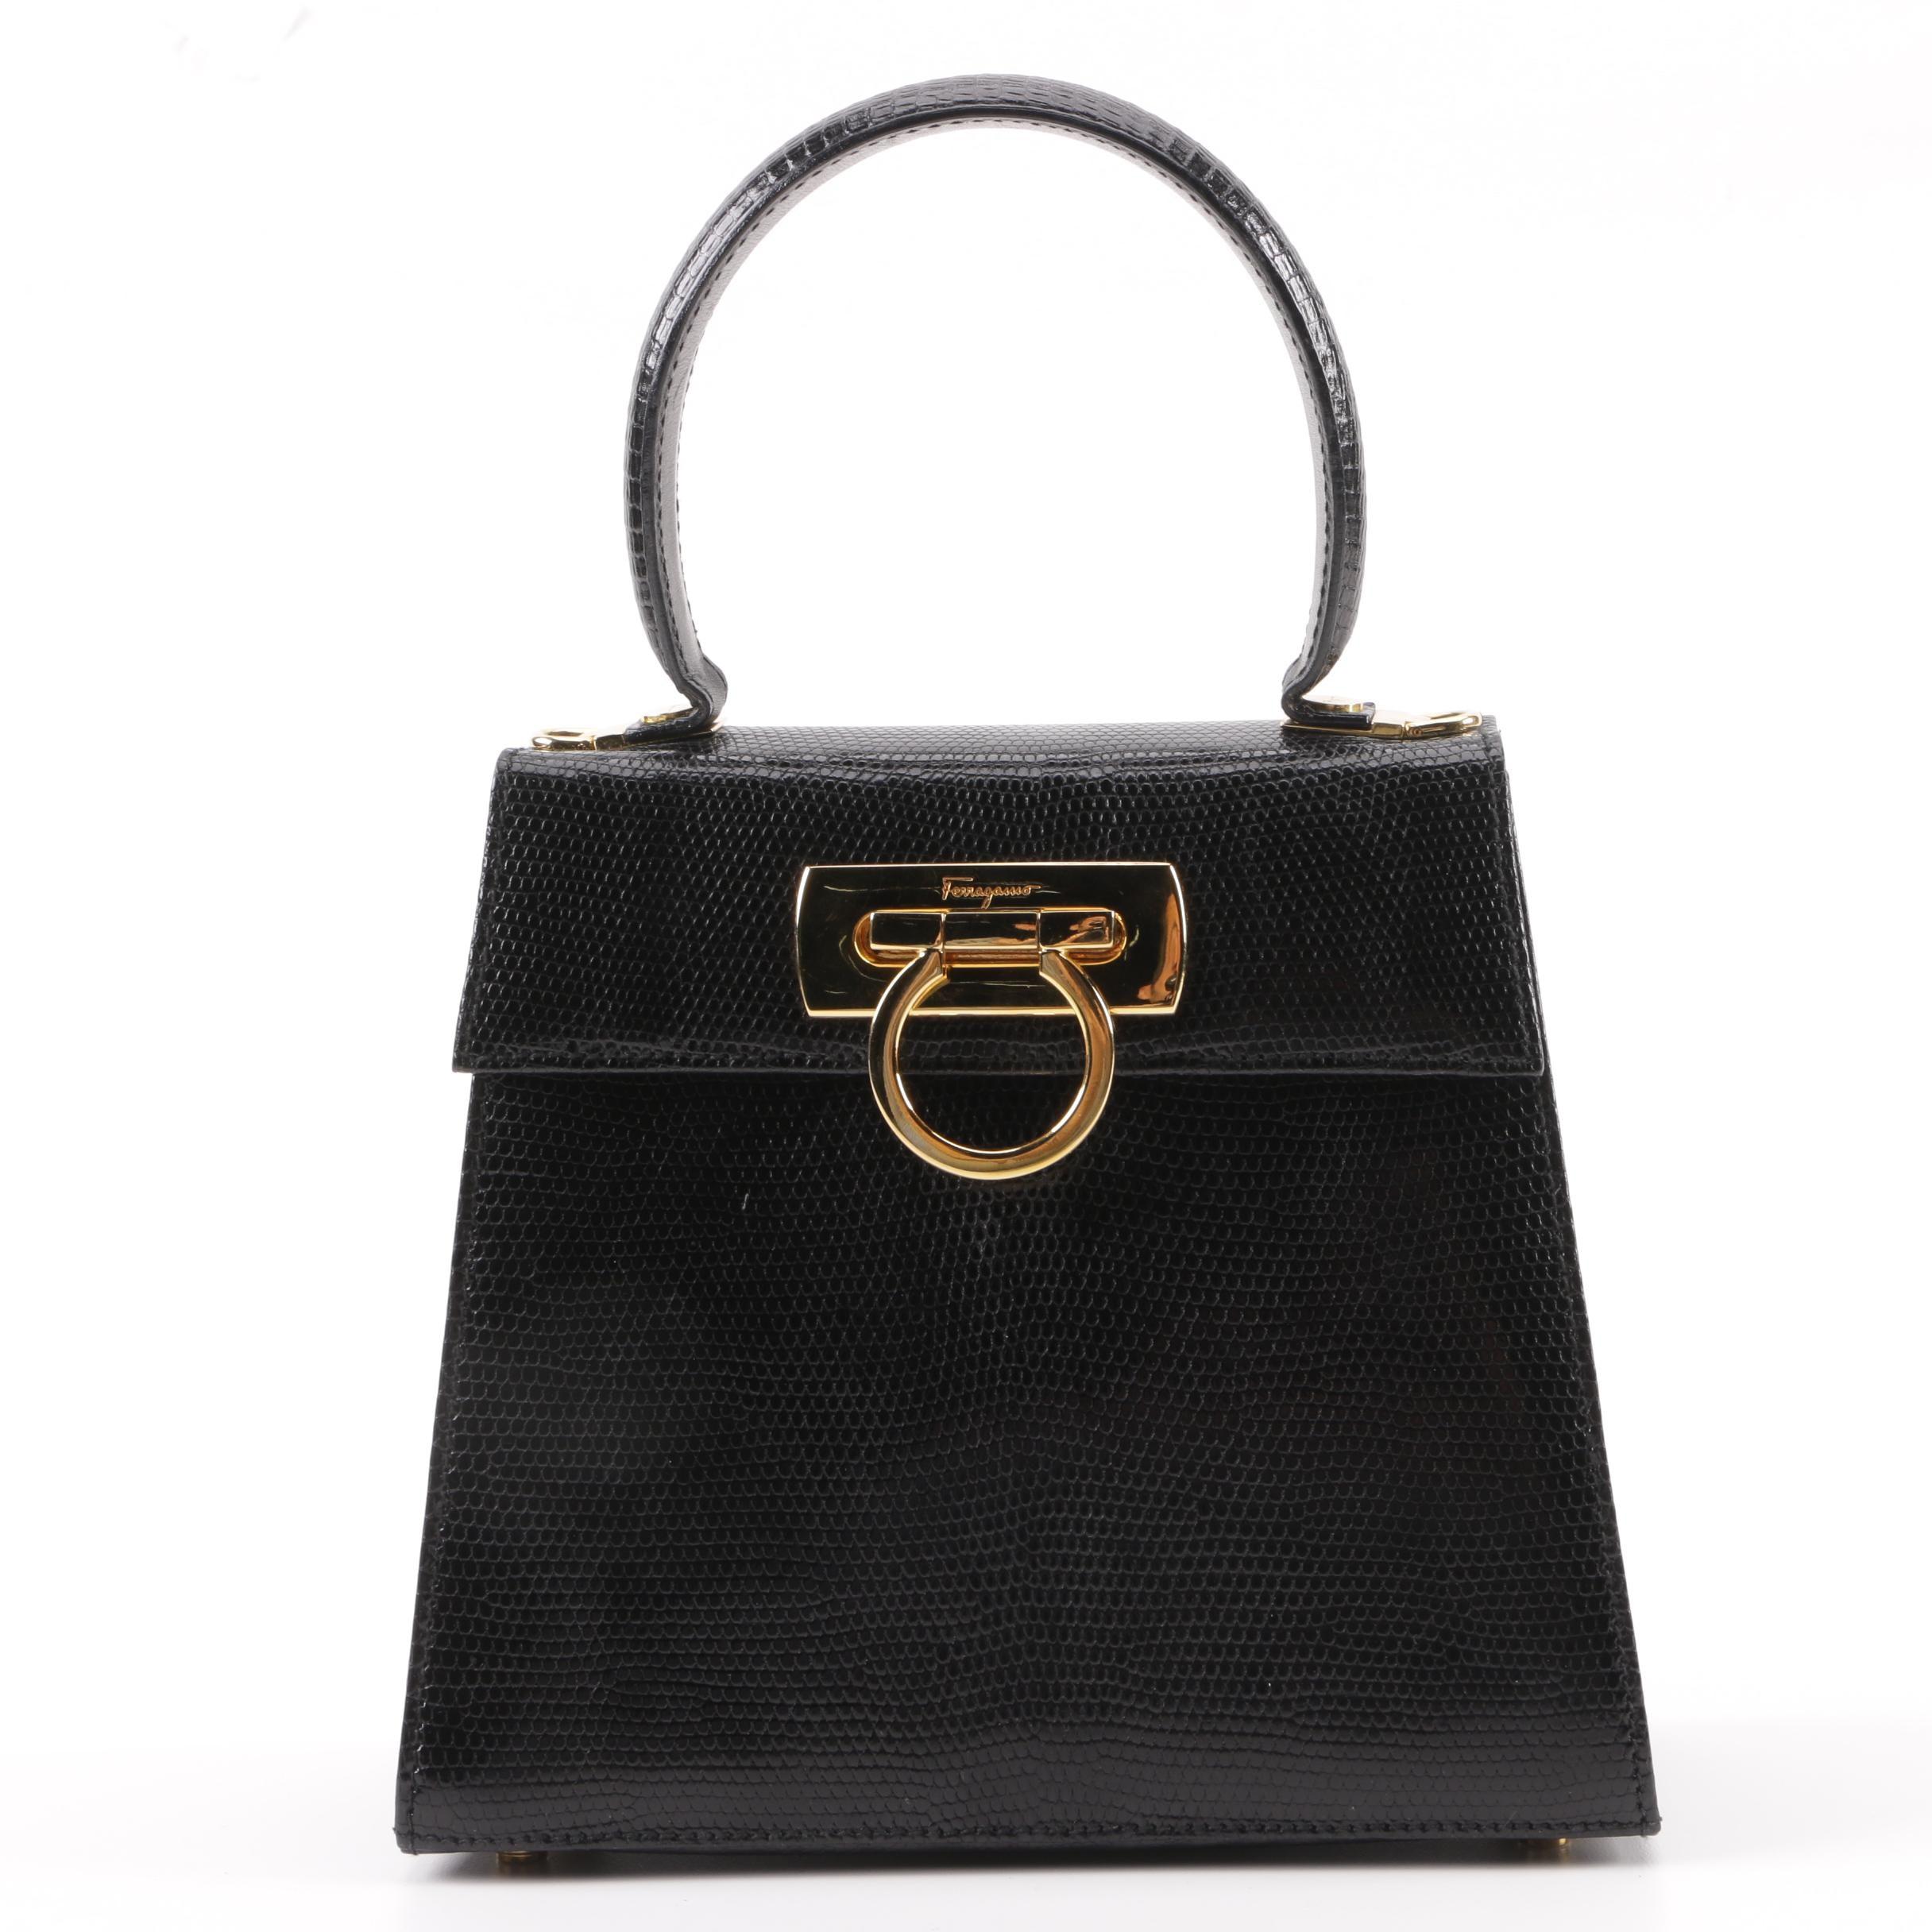 Salvatore Ferragamo Black Lizard Embossed Leather Lady Gancini Handbag